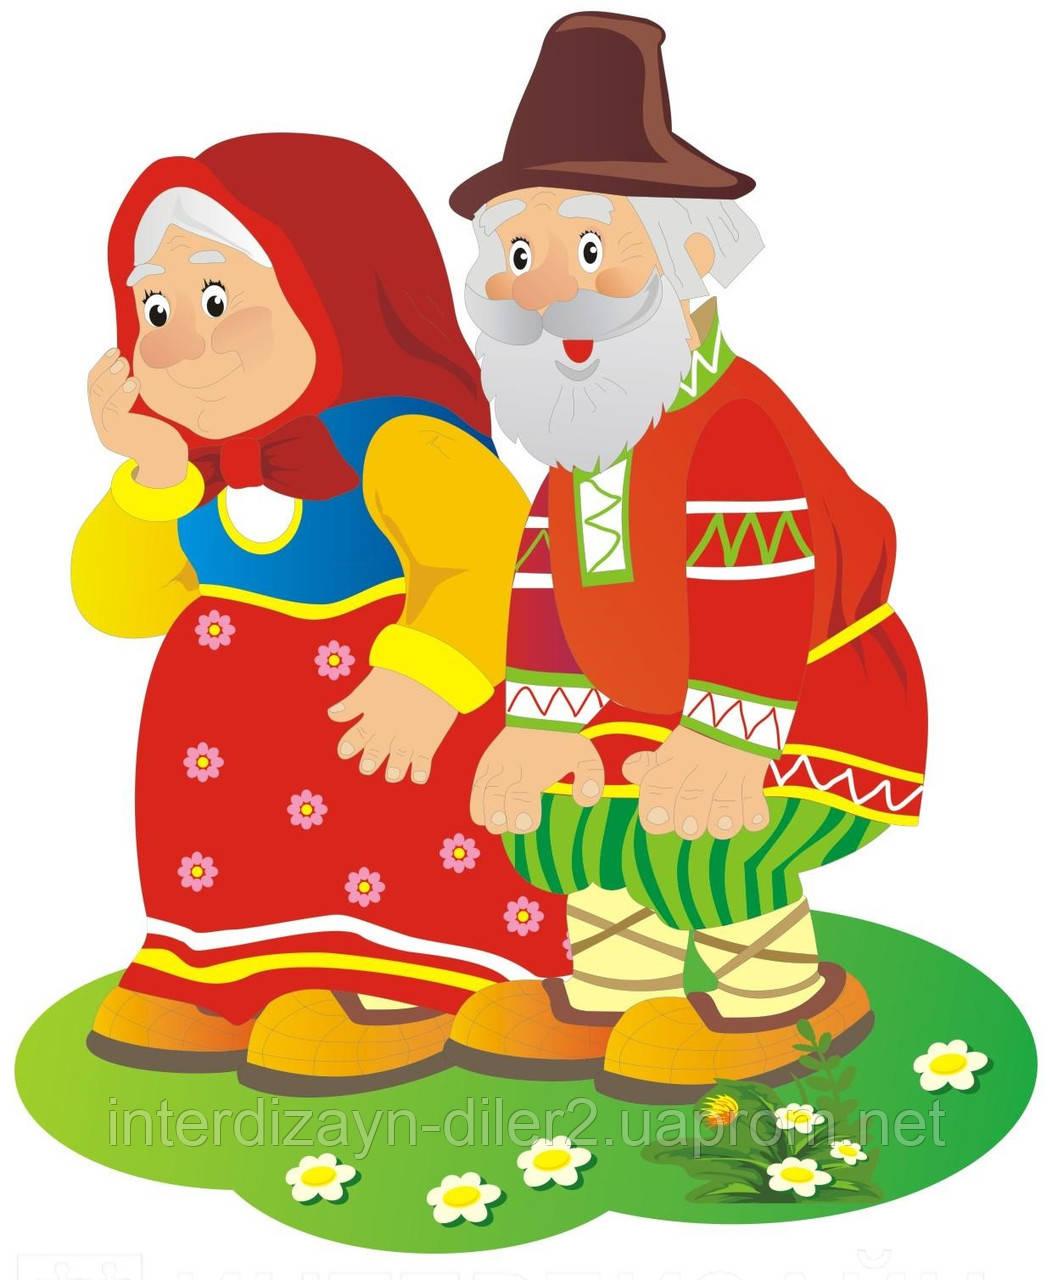 Декорация настенная Дедушка и бабушка